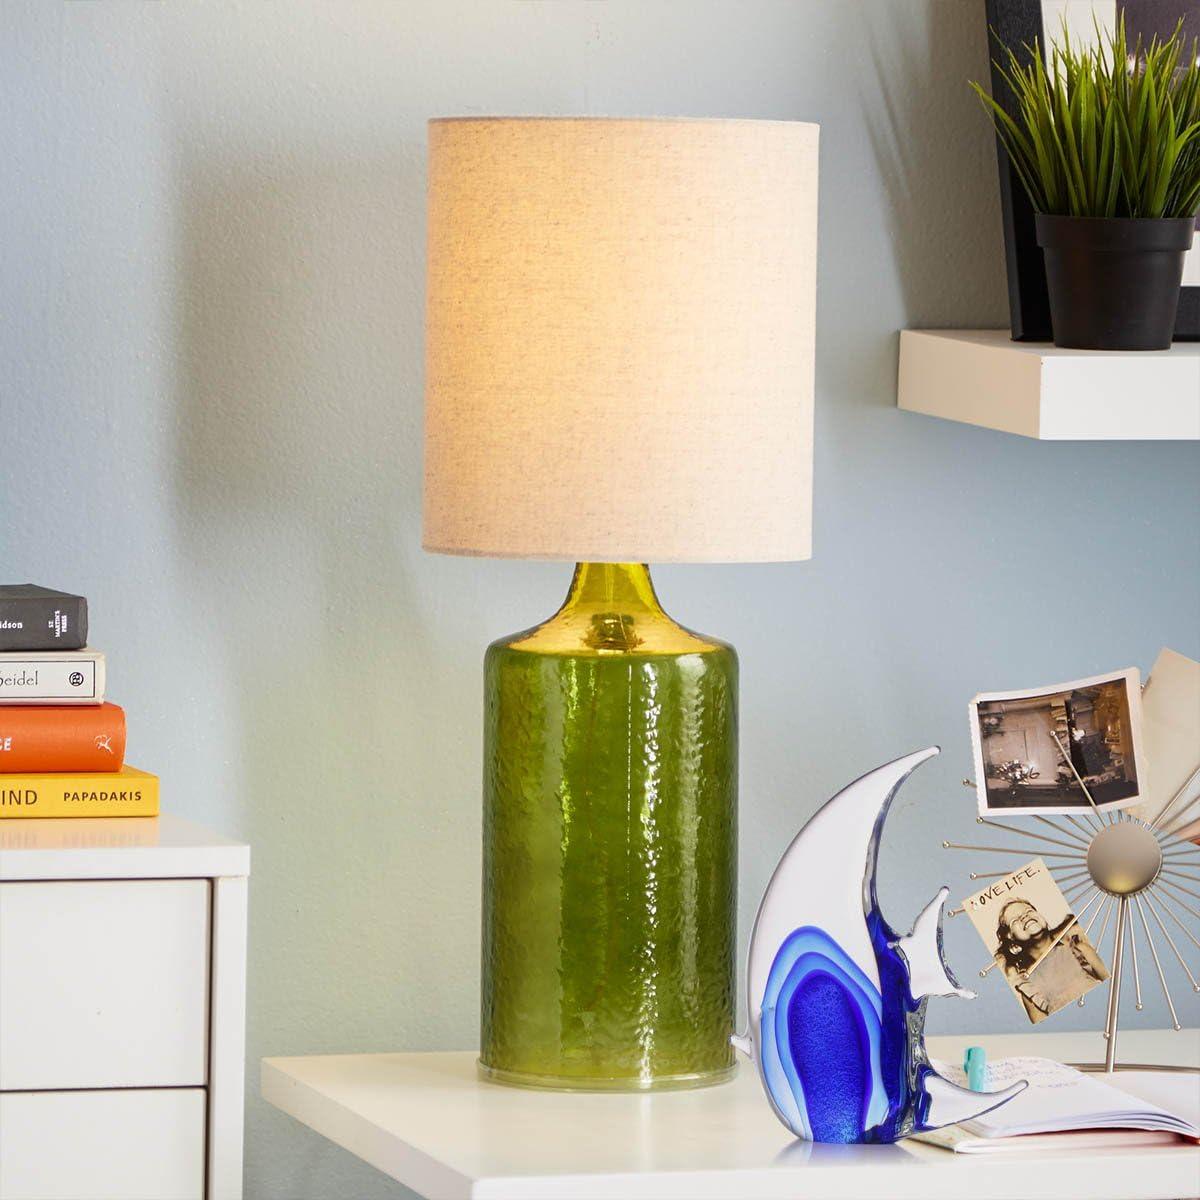 Tooarts Seahorse Cadeau Ornement en verre Figurine danimal Handblown Home Decor Pink /& Yellow